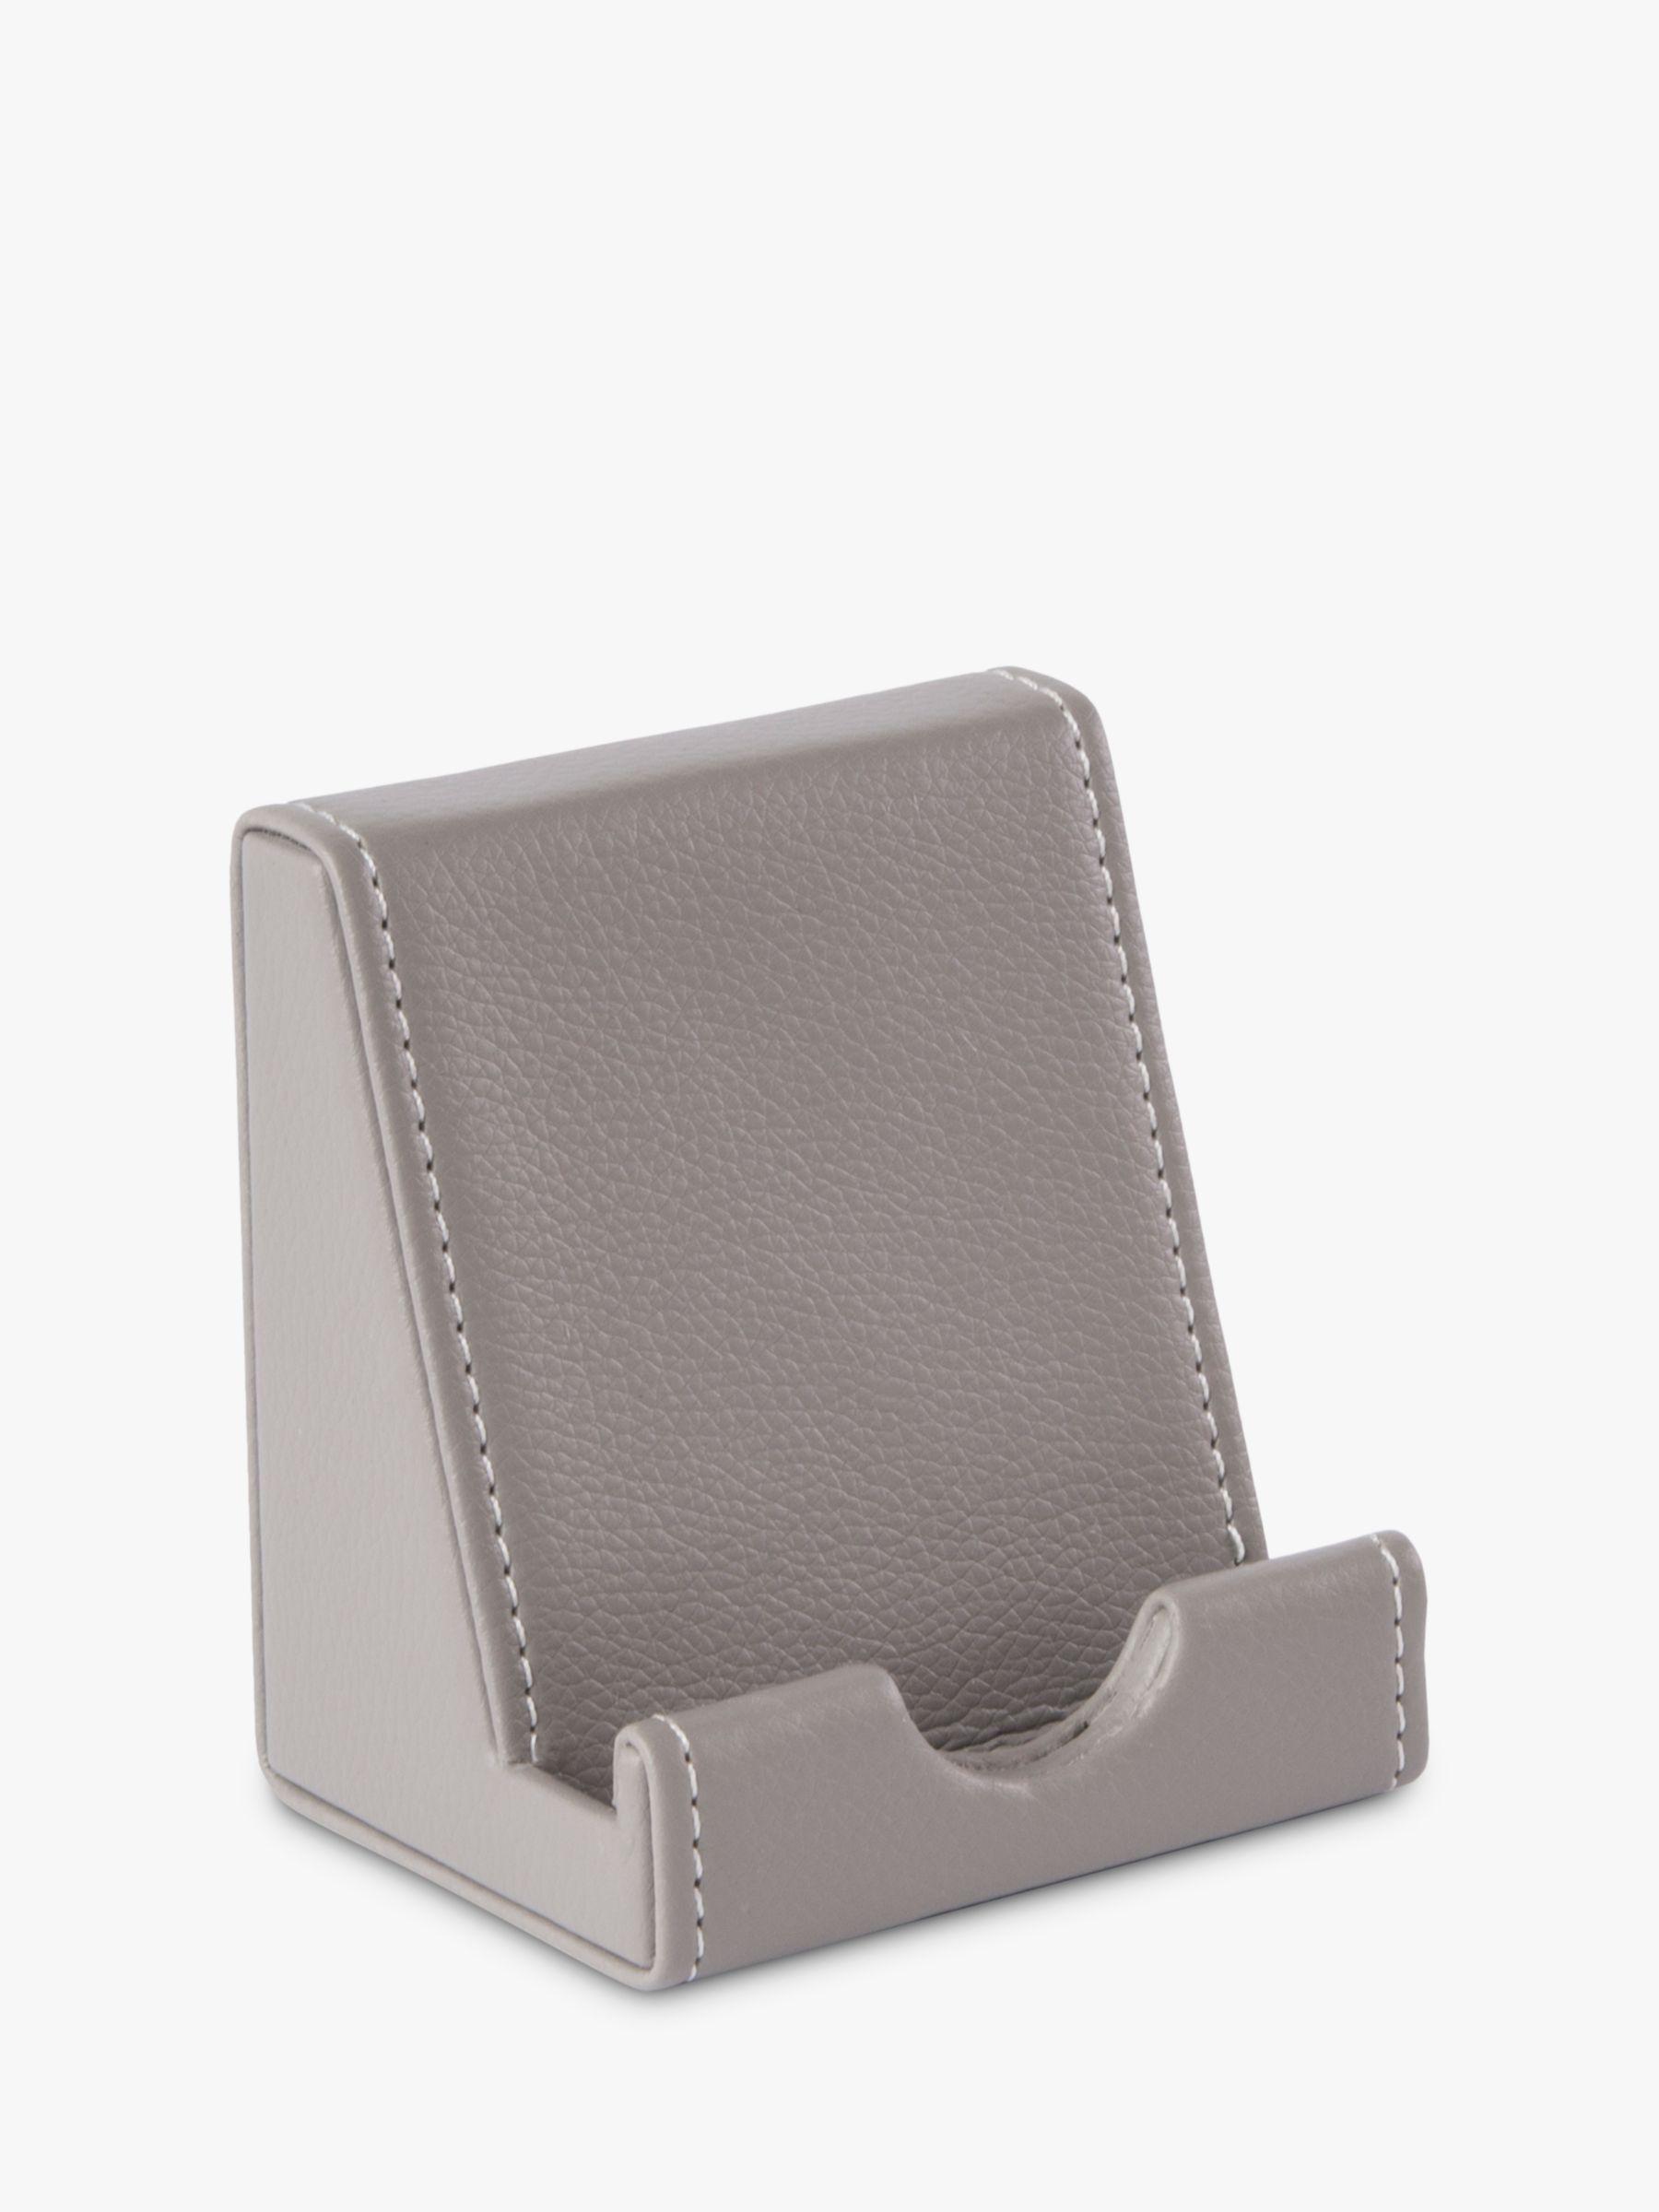 Osco Osco Faux Leather Smart Phone Holder